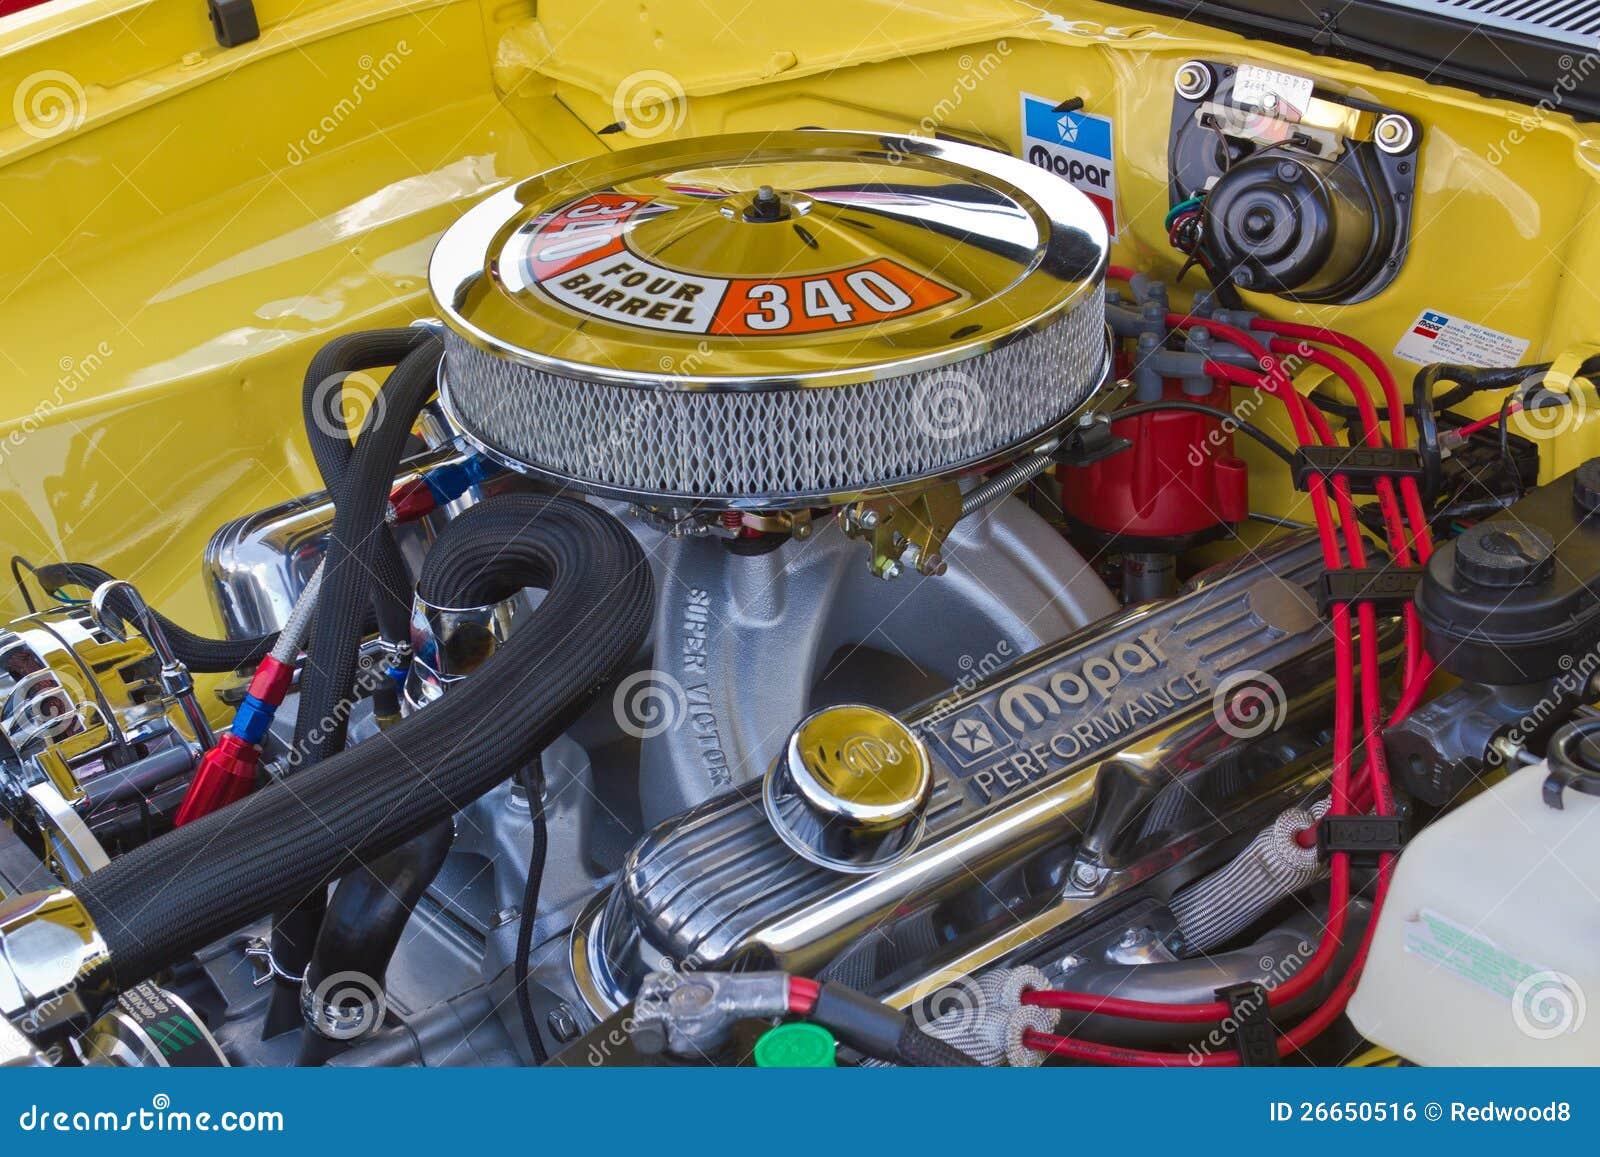 4.7 Dodge Engine >> Mopar 340 Engine editorial photo. Image of barrel, parts - 26650516